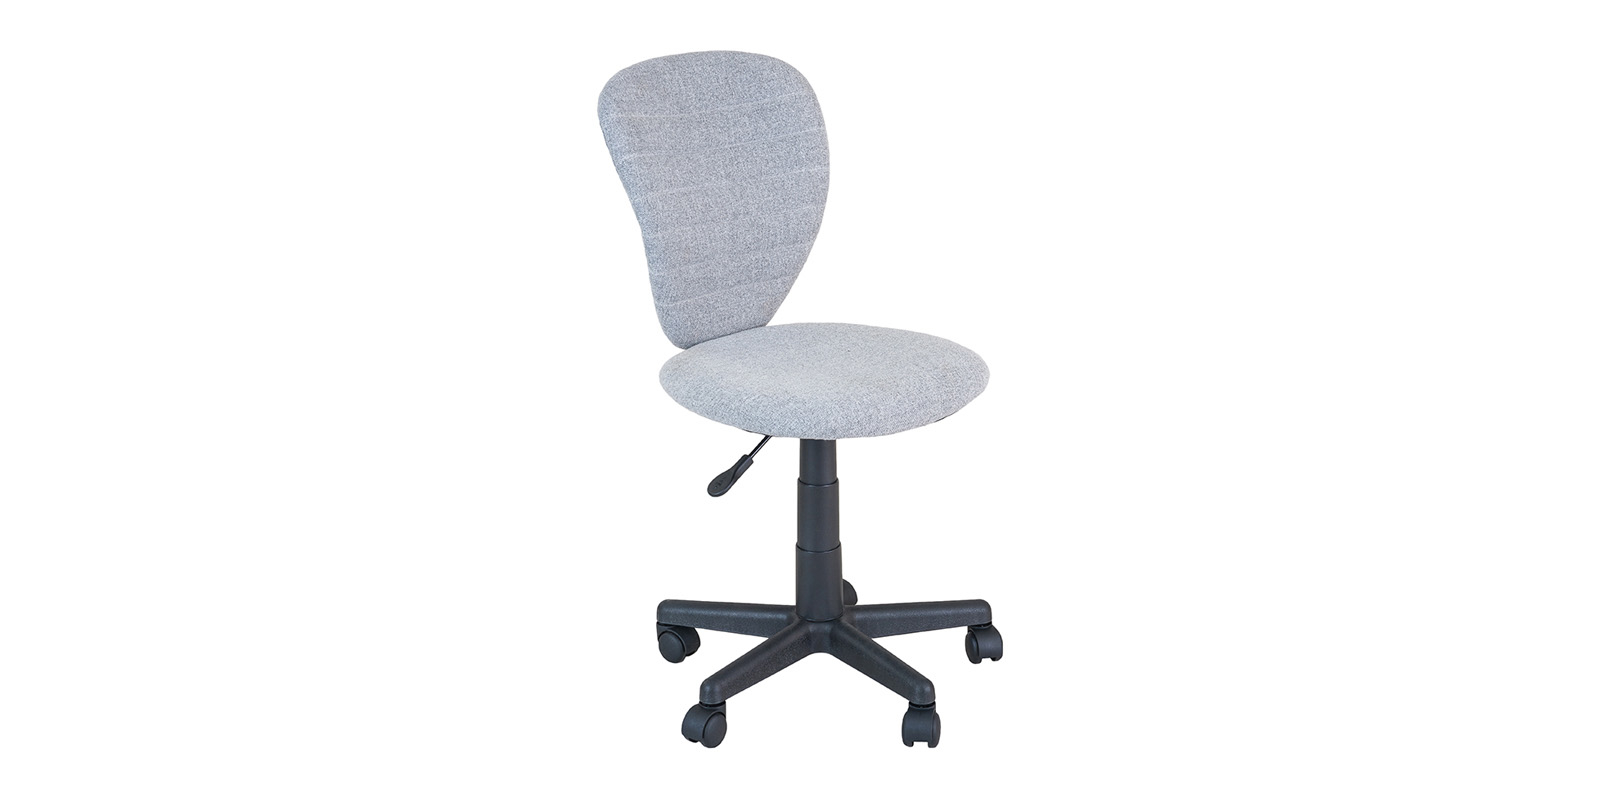 Детский стул LST2 GREY (серый)